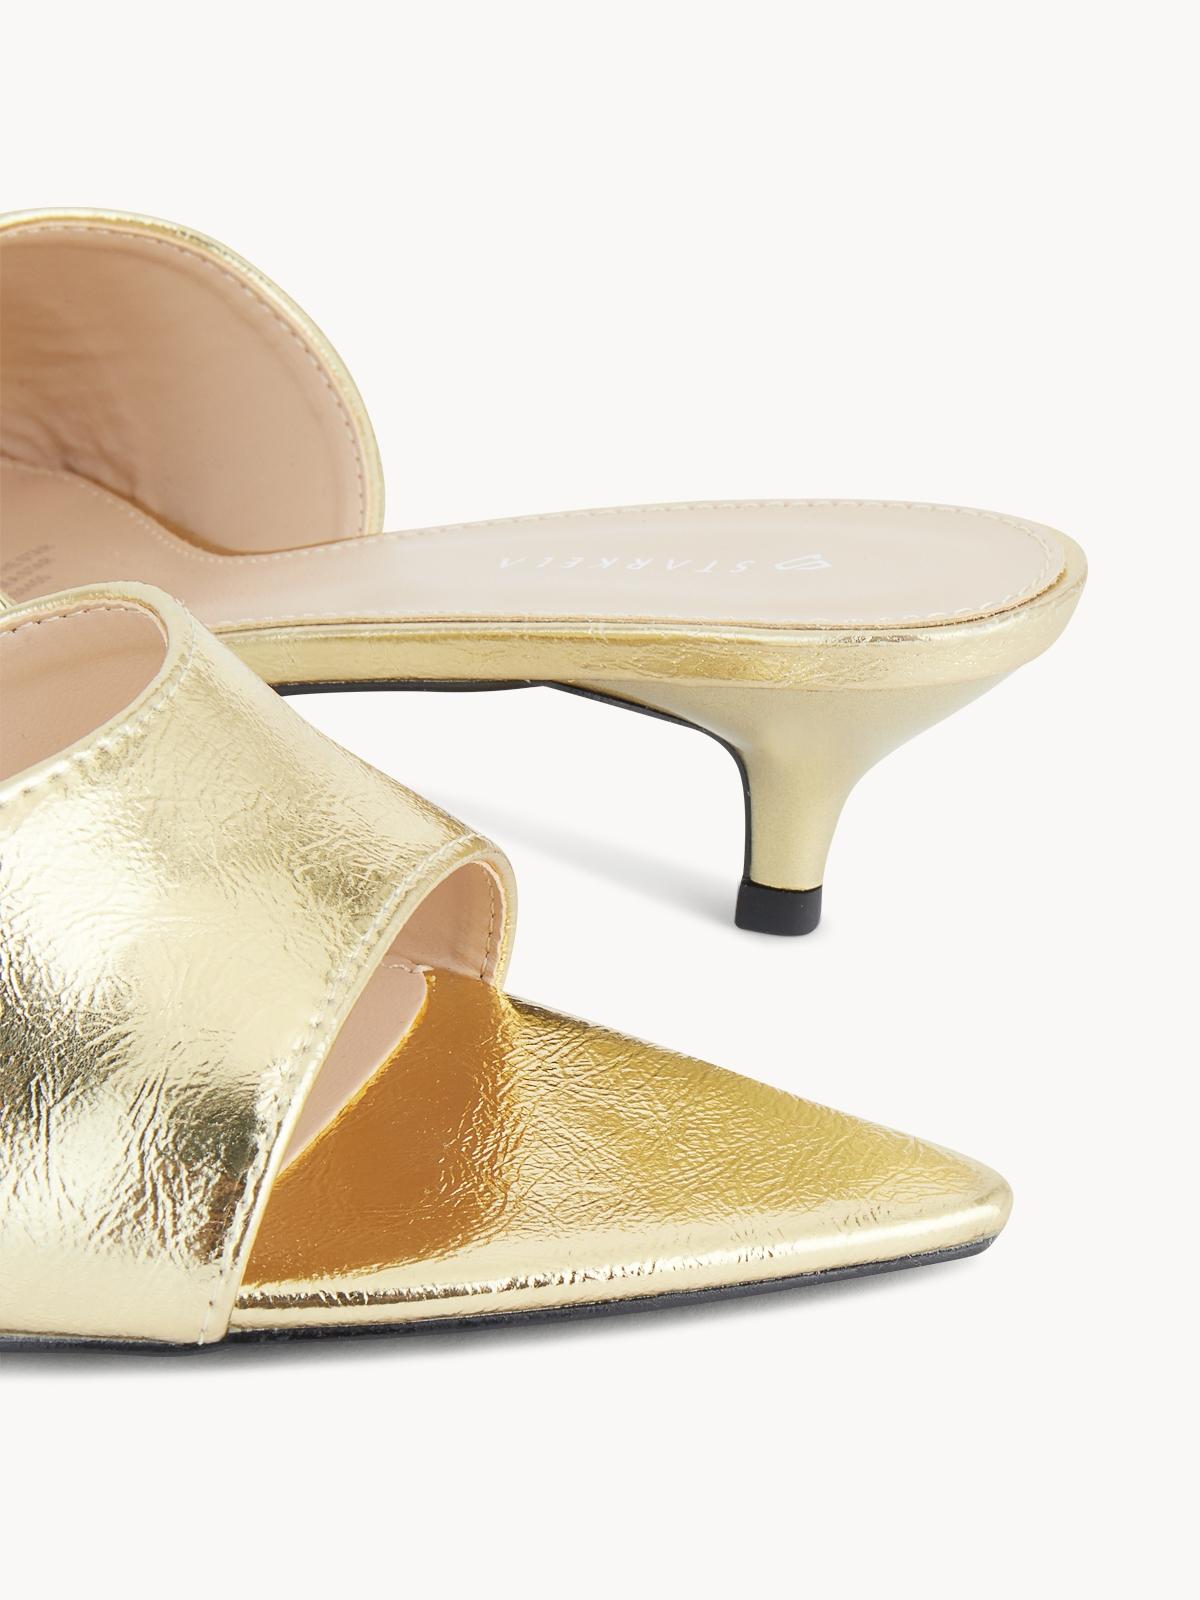 Starkela Mule Mid Heels Gold